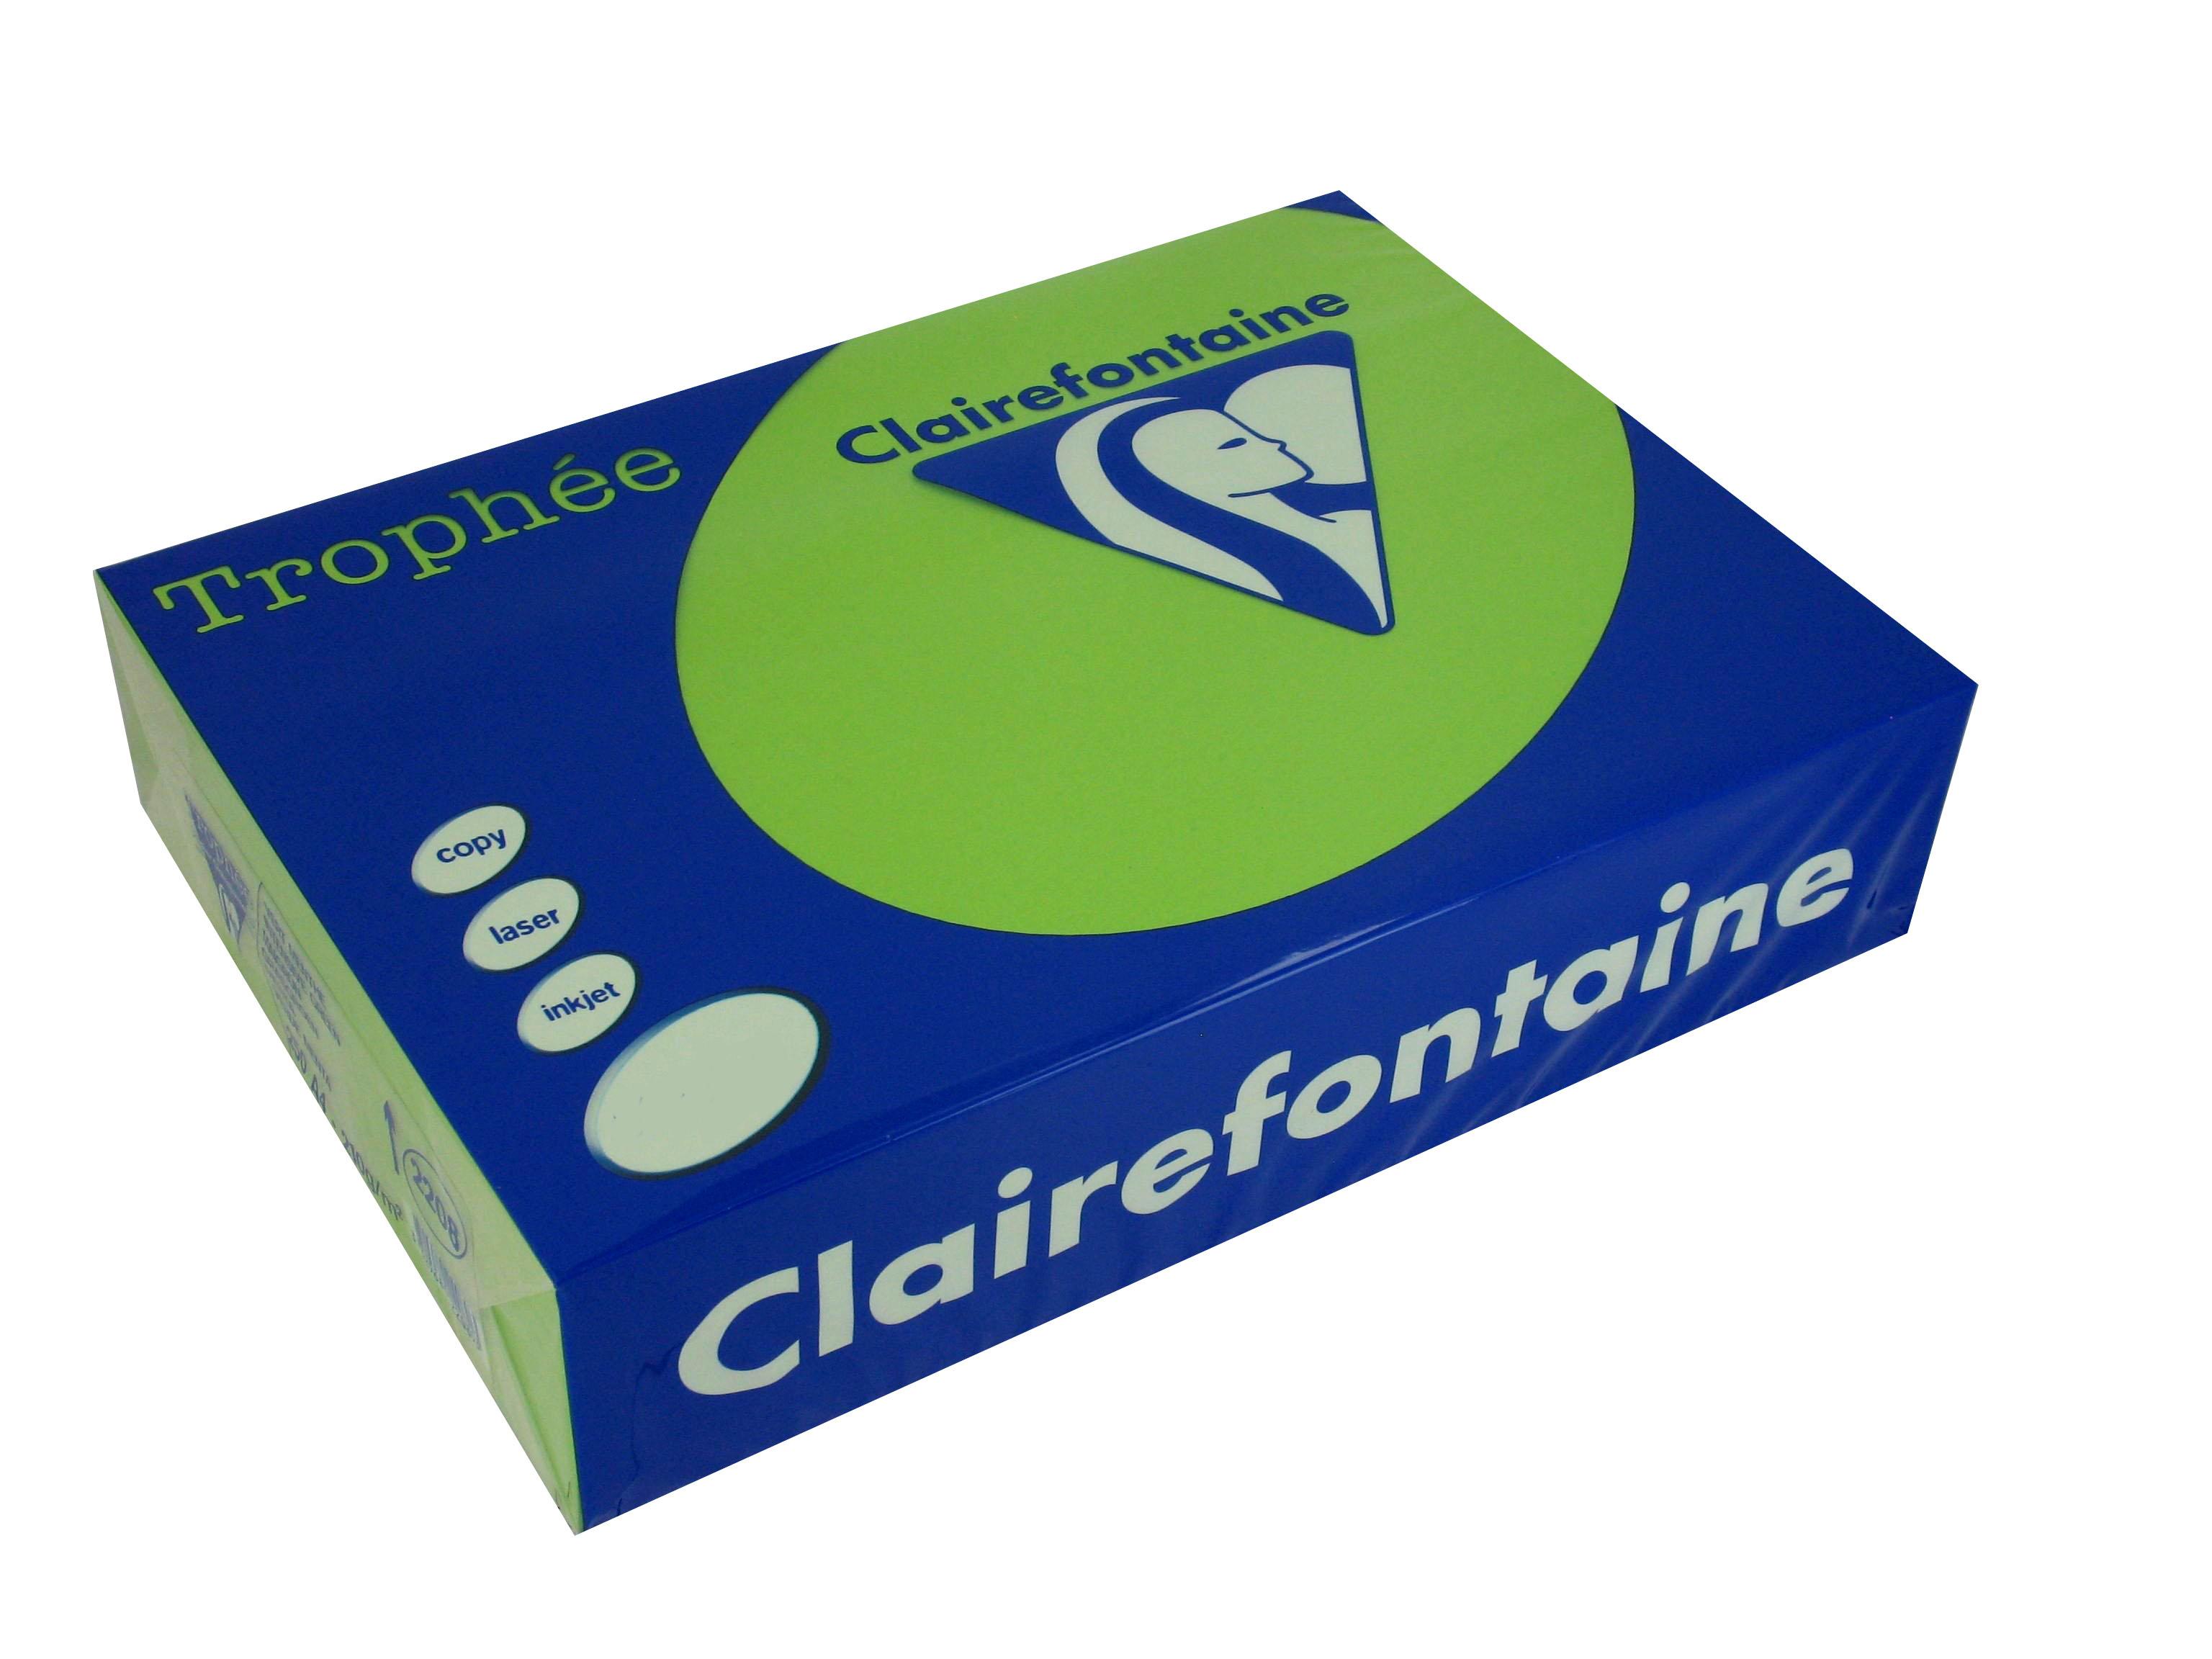 Clairefontaine Trophee Papier Maigrün 160g/m² DIN-A4 - 250 Blatt